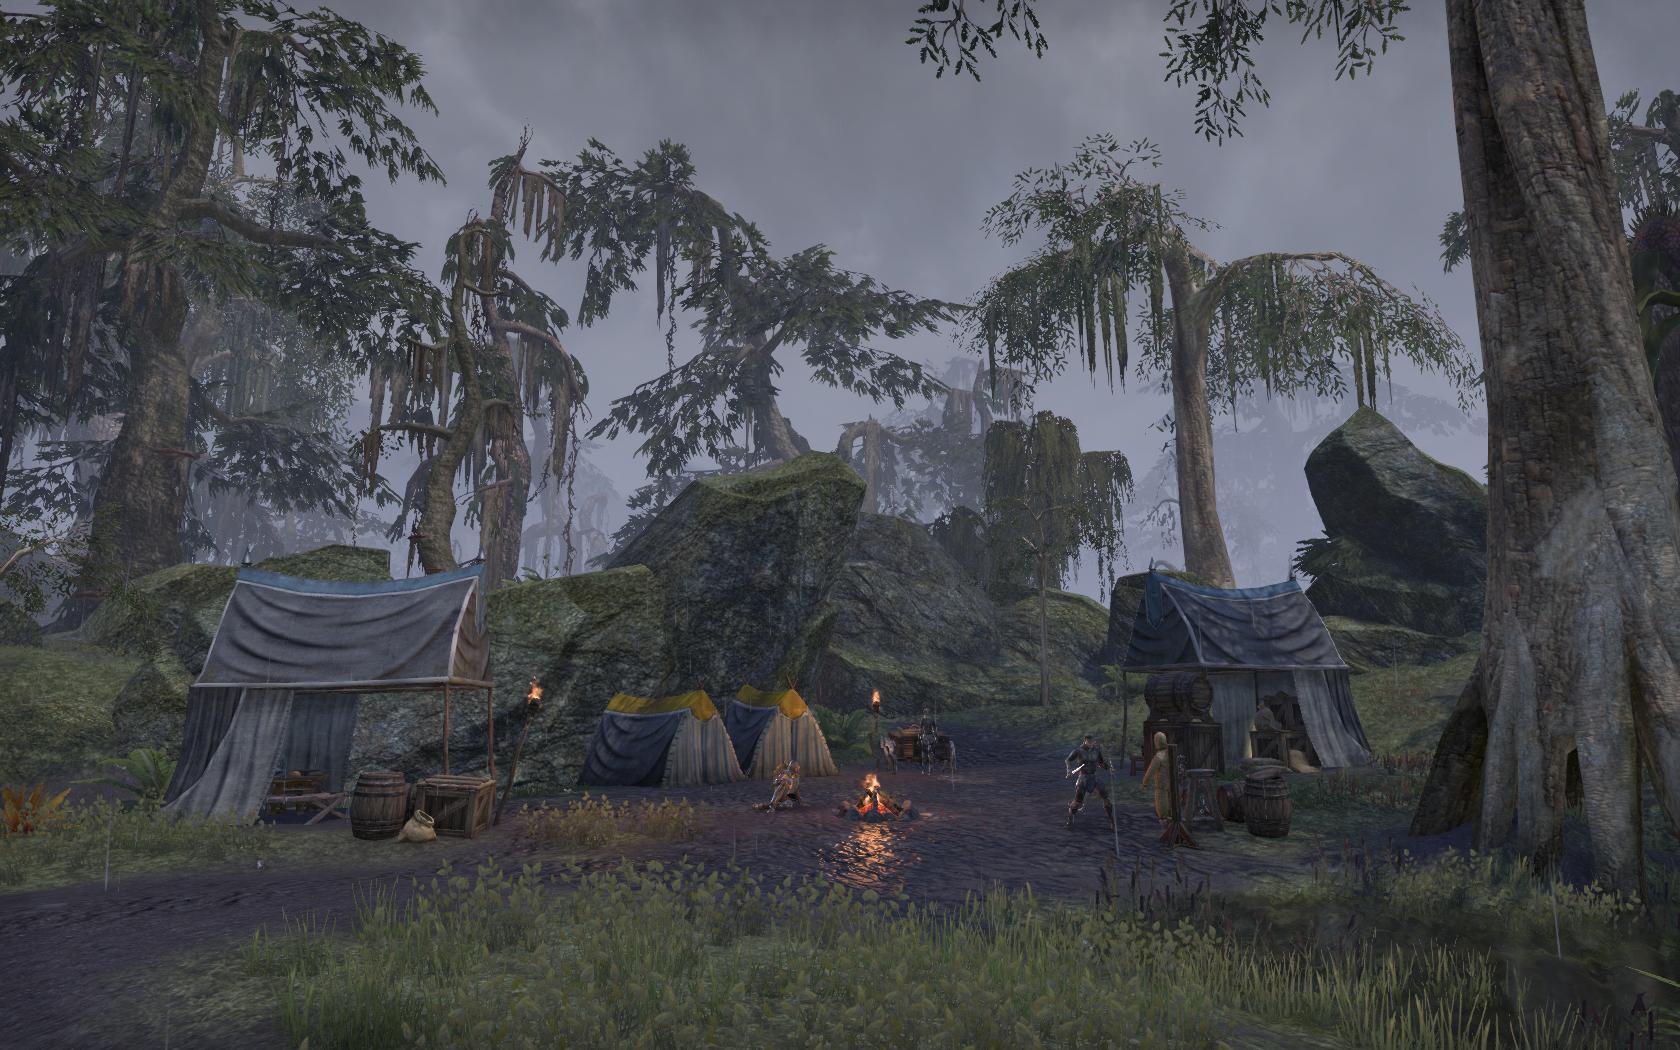 Camp Silken Snare